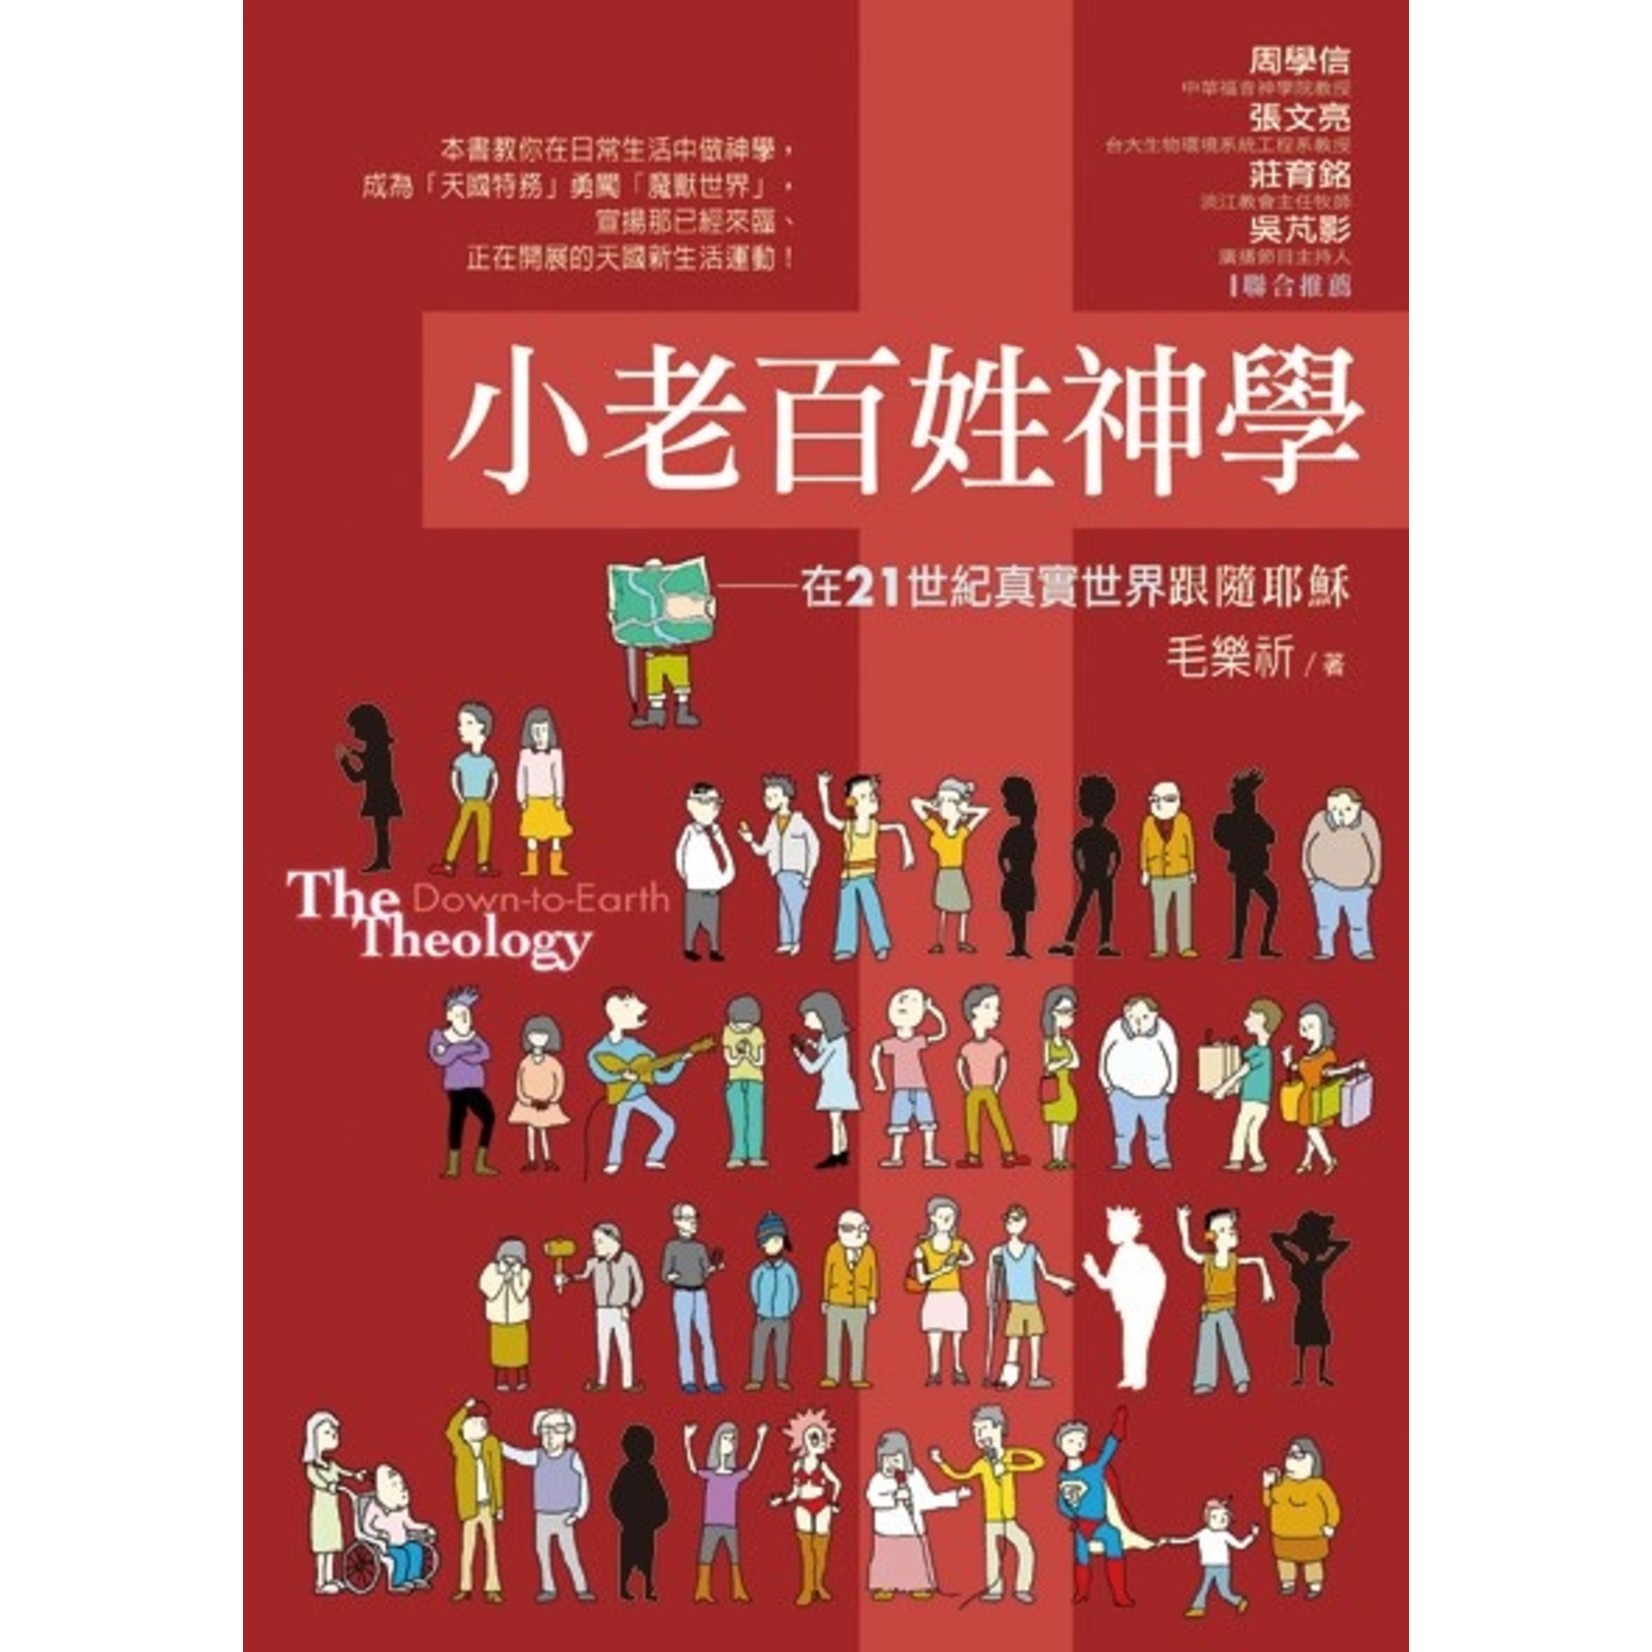 校園書房 Campus Books 小老百姓神學:在21世紀真實世界跟隨耶穌 The Down-to-Earth Theology